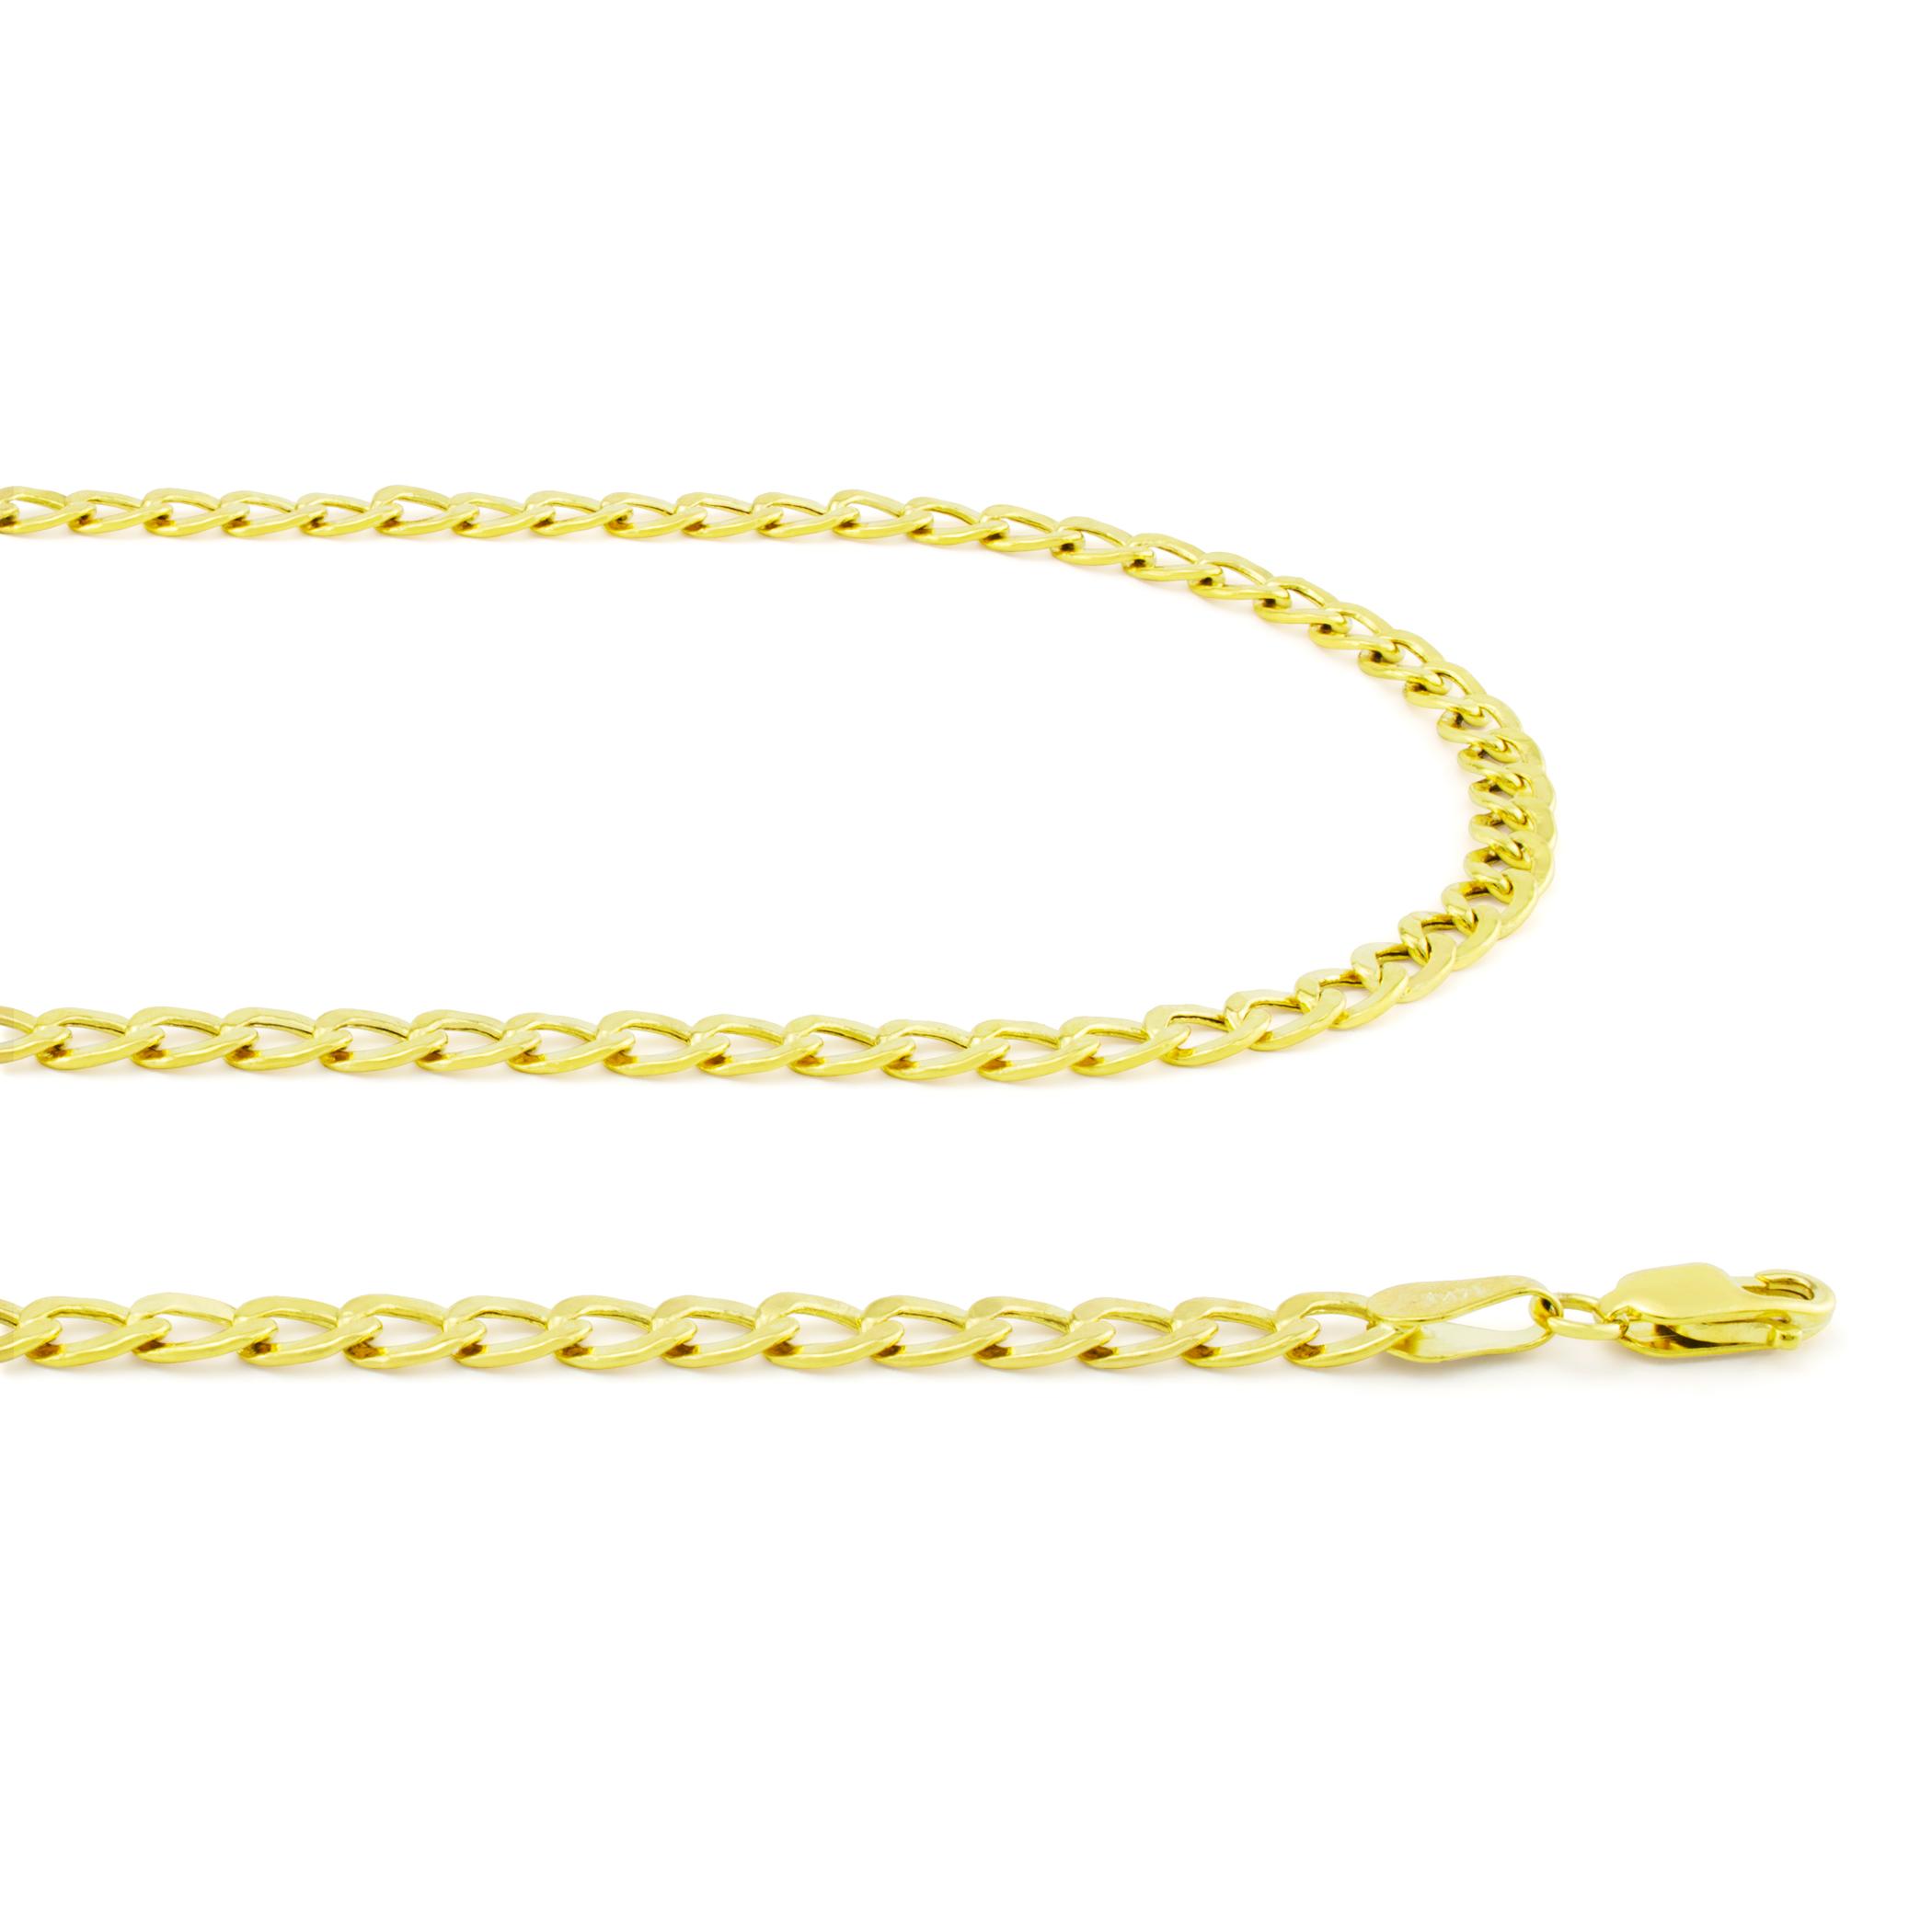 14K-Yellow-Gold-3-5mm-Women-Curb-Cuban-Chain-Link-Bracelet-Anklet-Chain-7-034-8-034-9-034 thumbnail 22